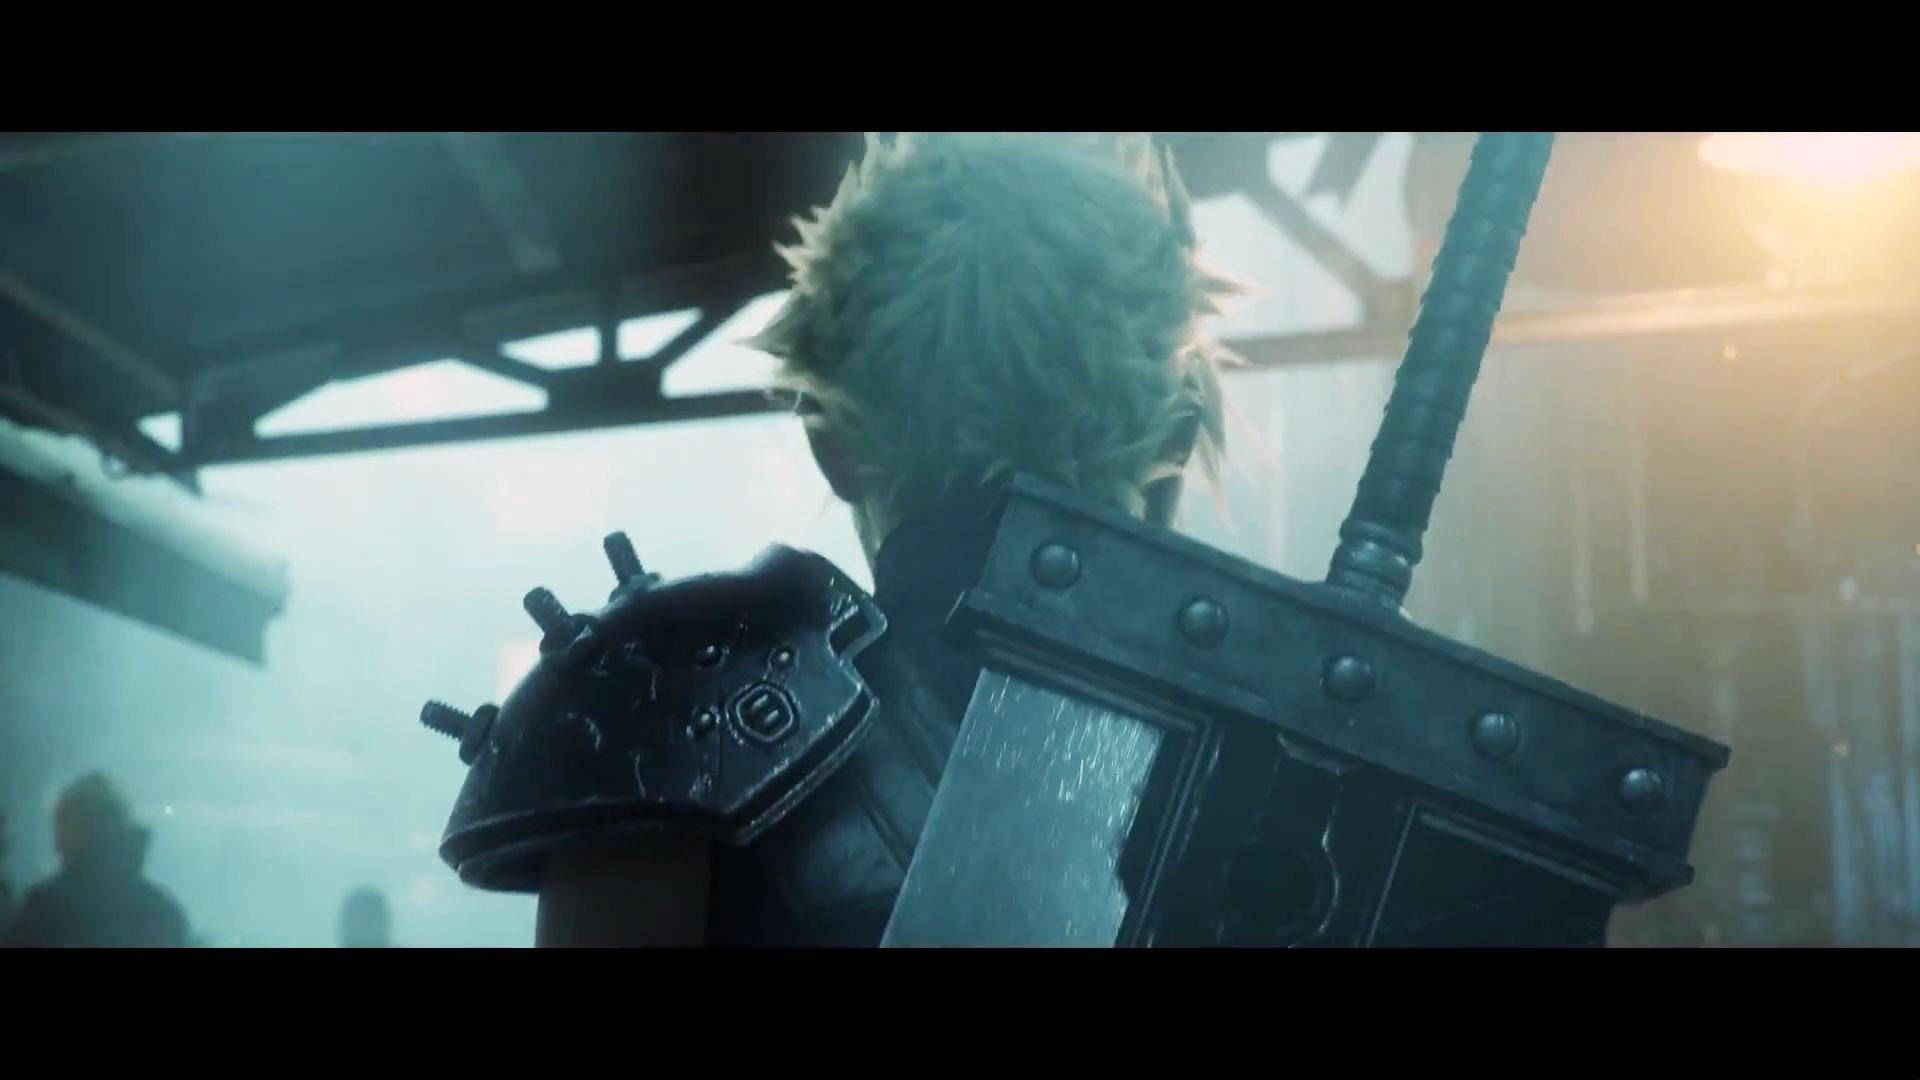 HD Final Fantasy 7 Remake Wallpaper Hd | wallpaper prambanan